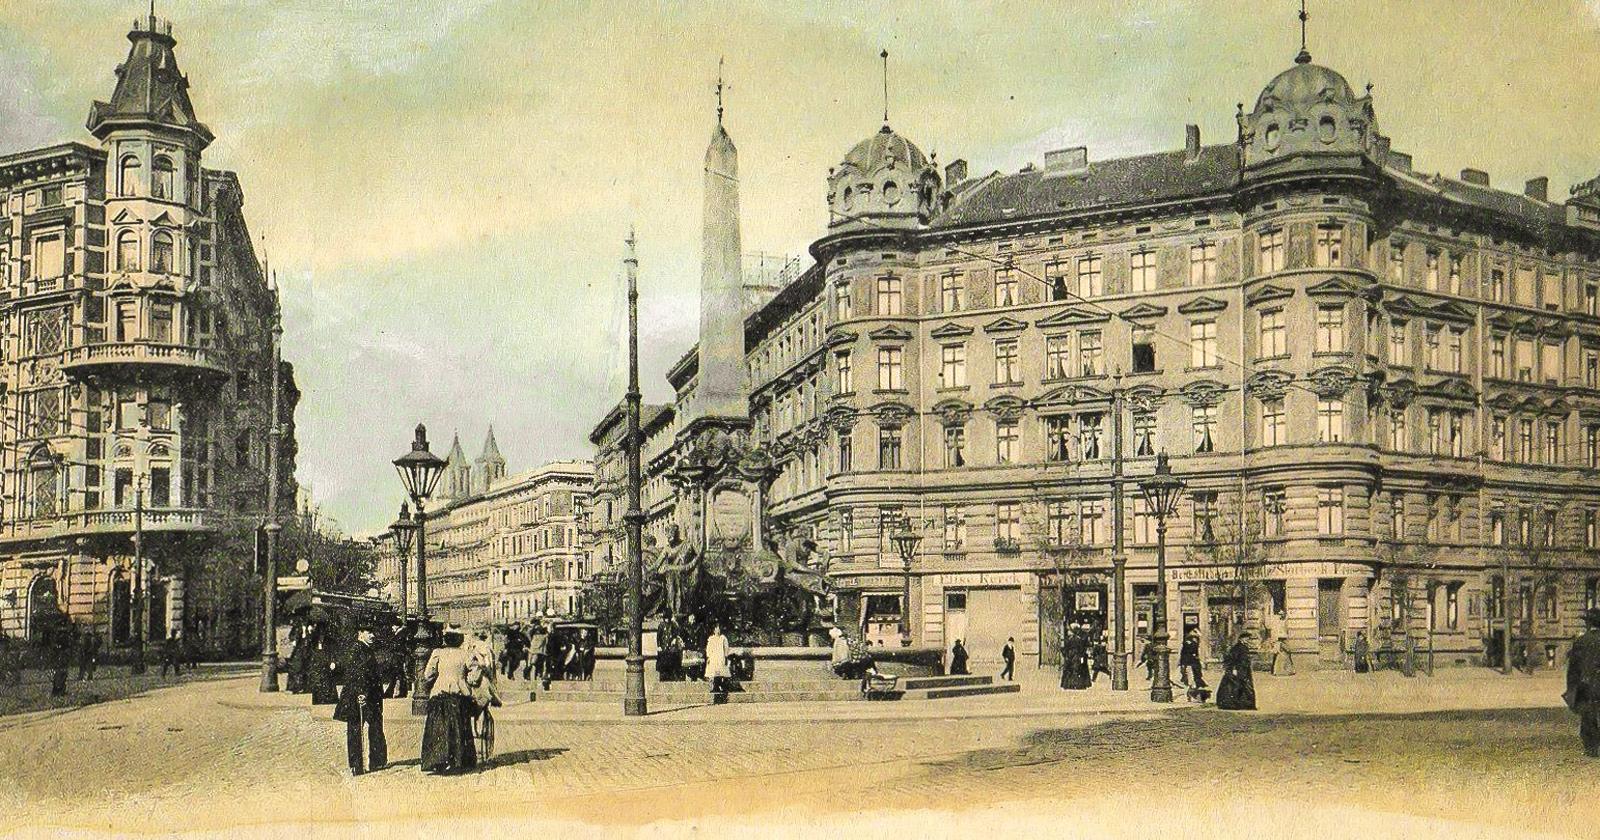 Hasselbachplatz_Zeitreisen_Magdeburg_Alt-2